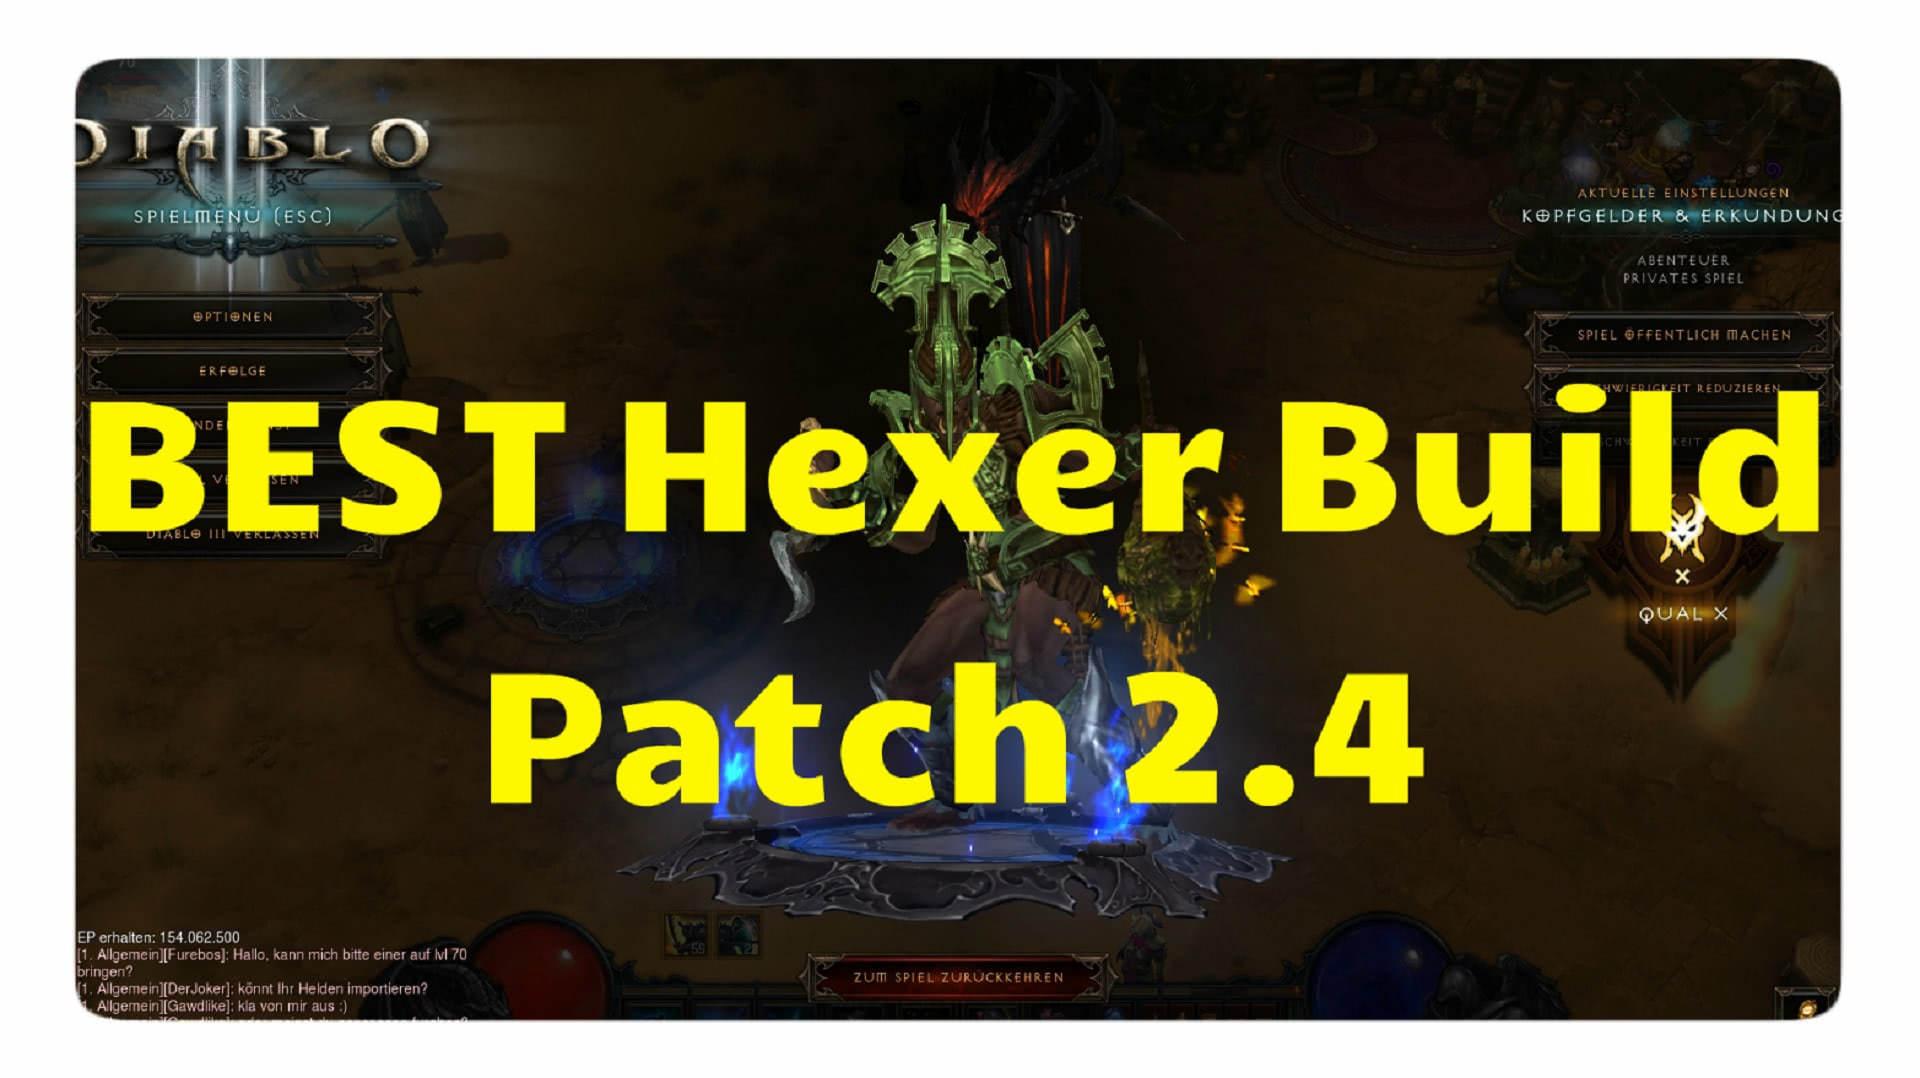 Diablo  Season  Build Hexer